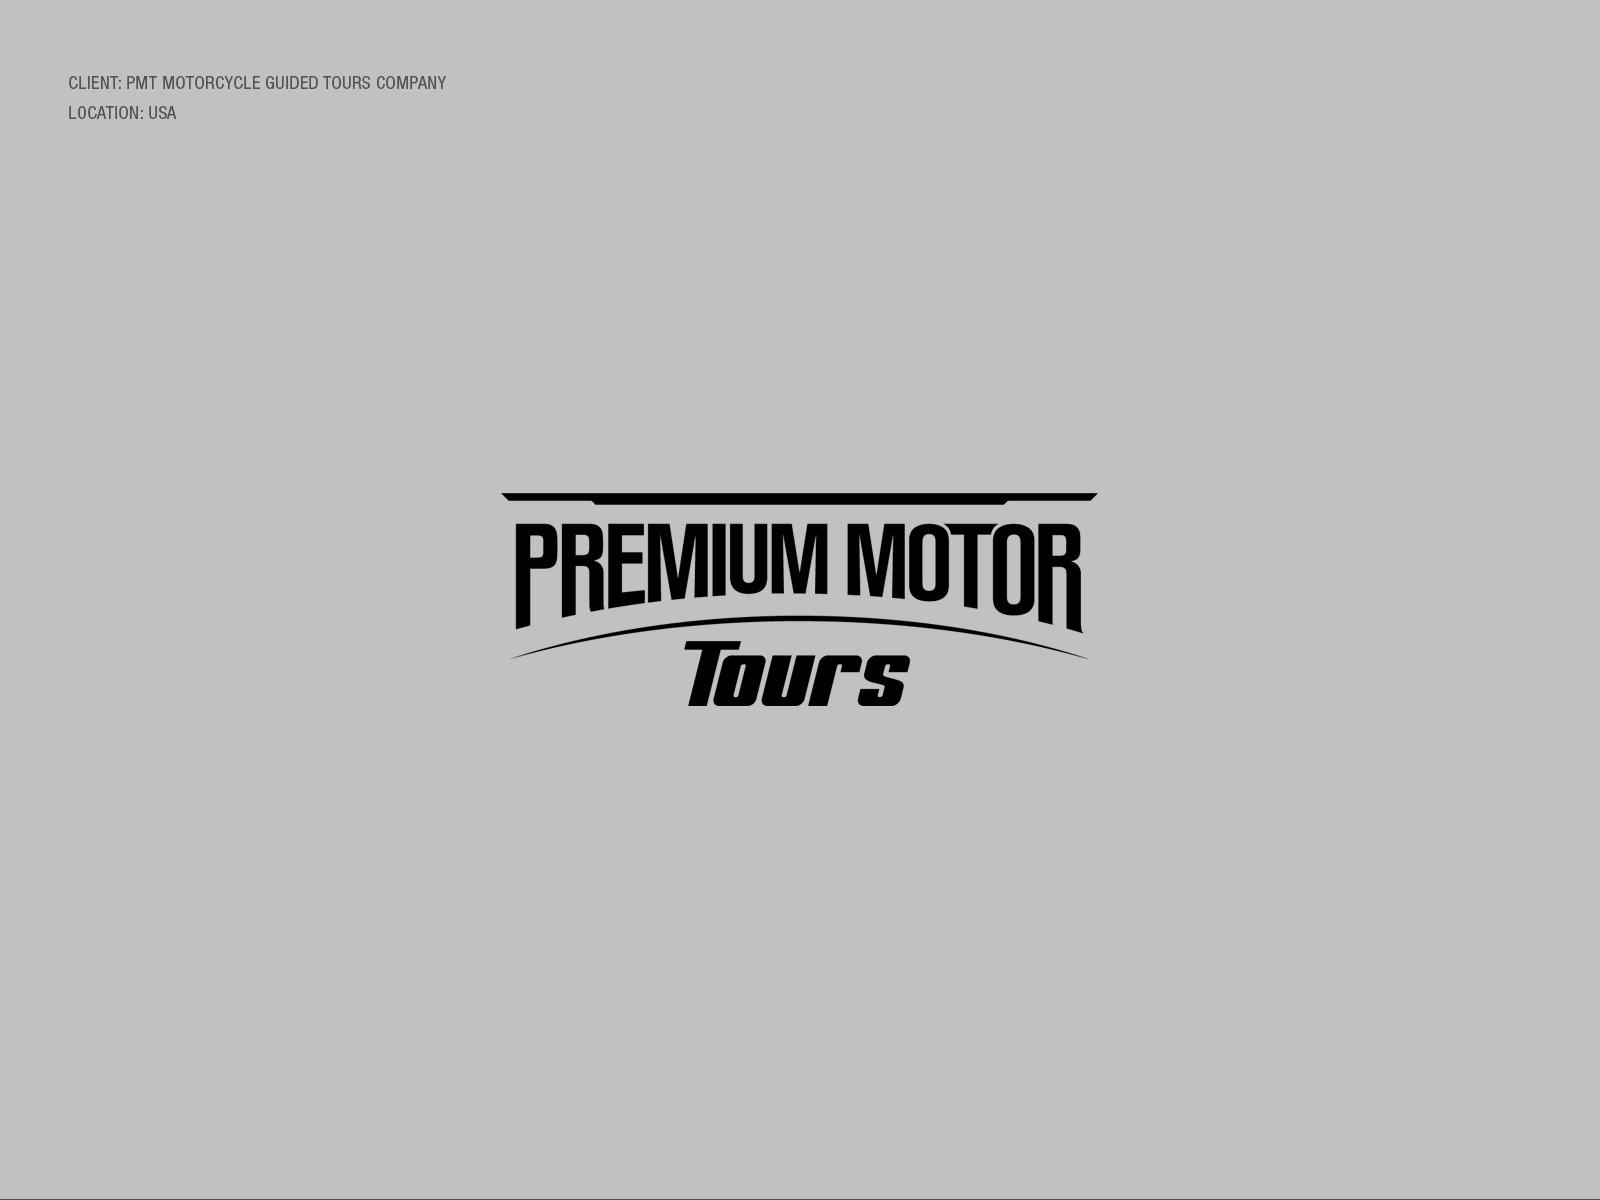 logodesign-premiummotortours